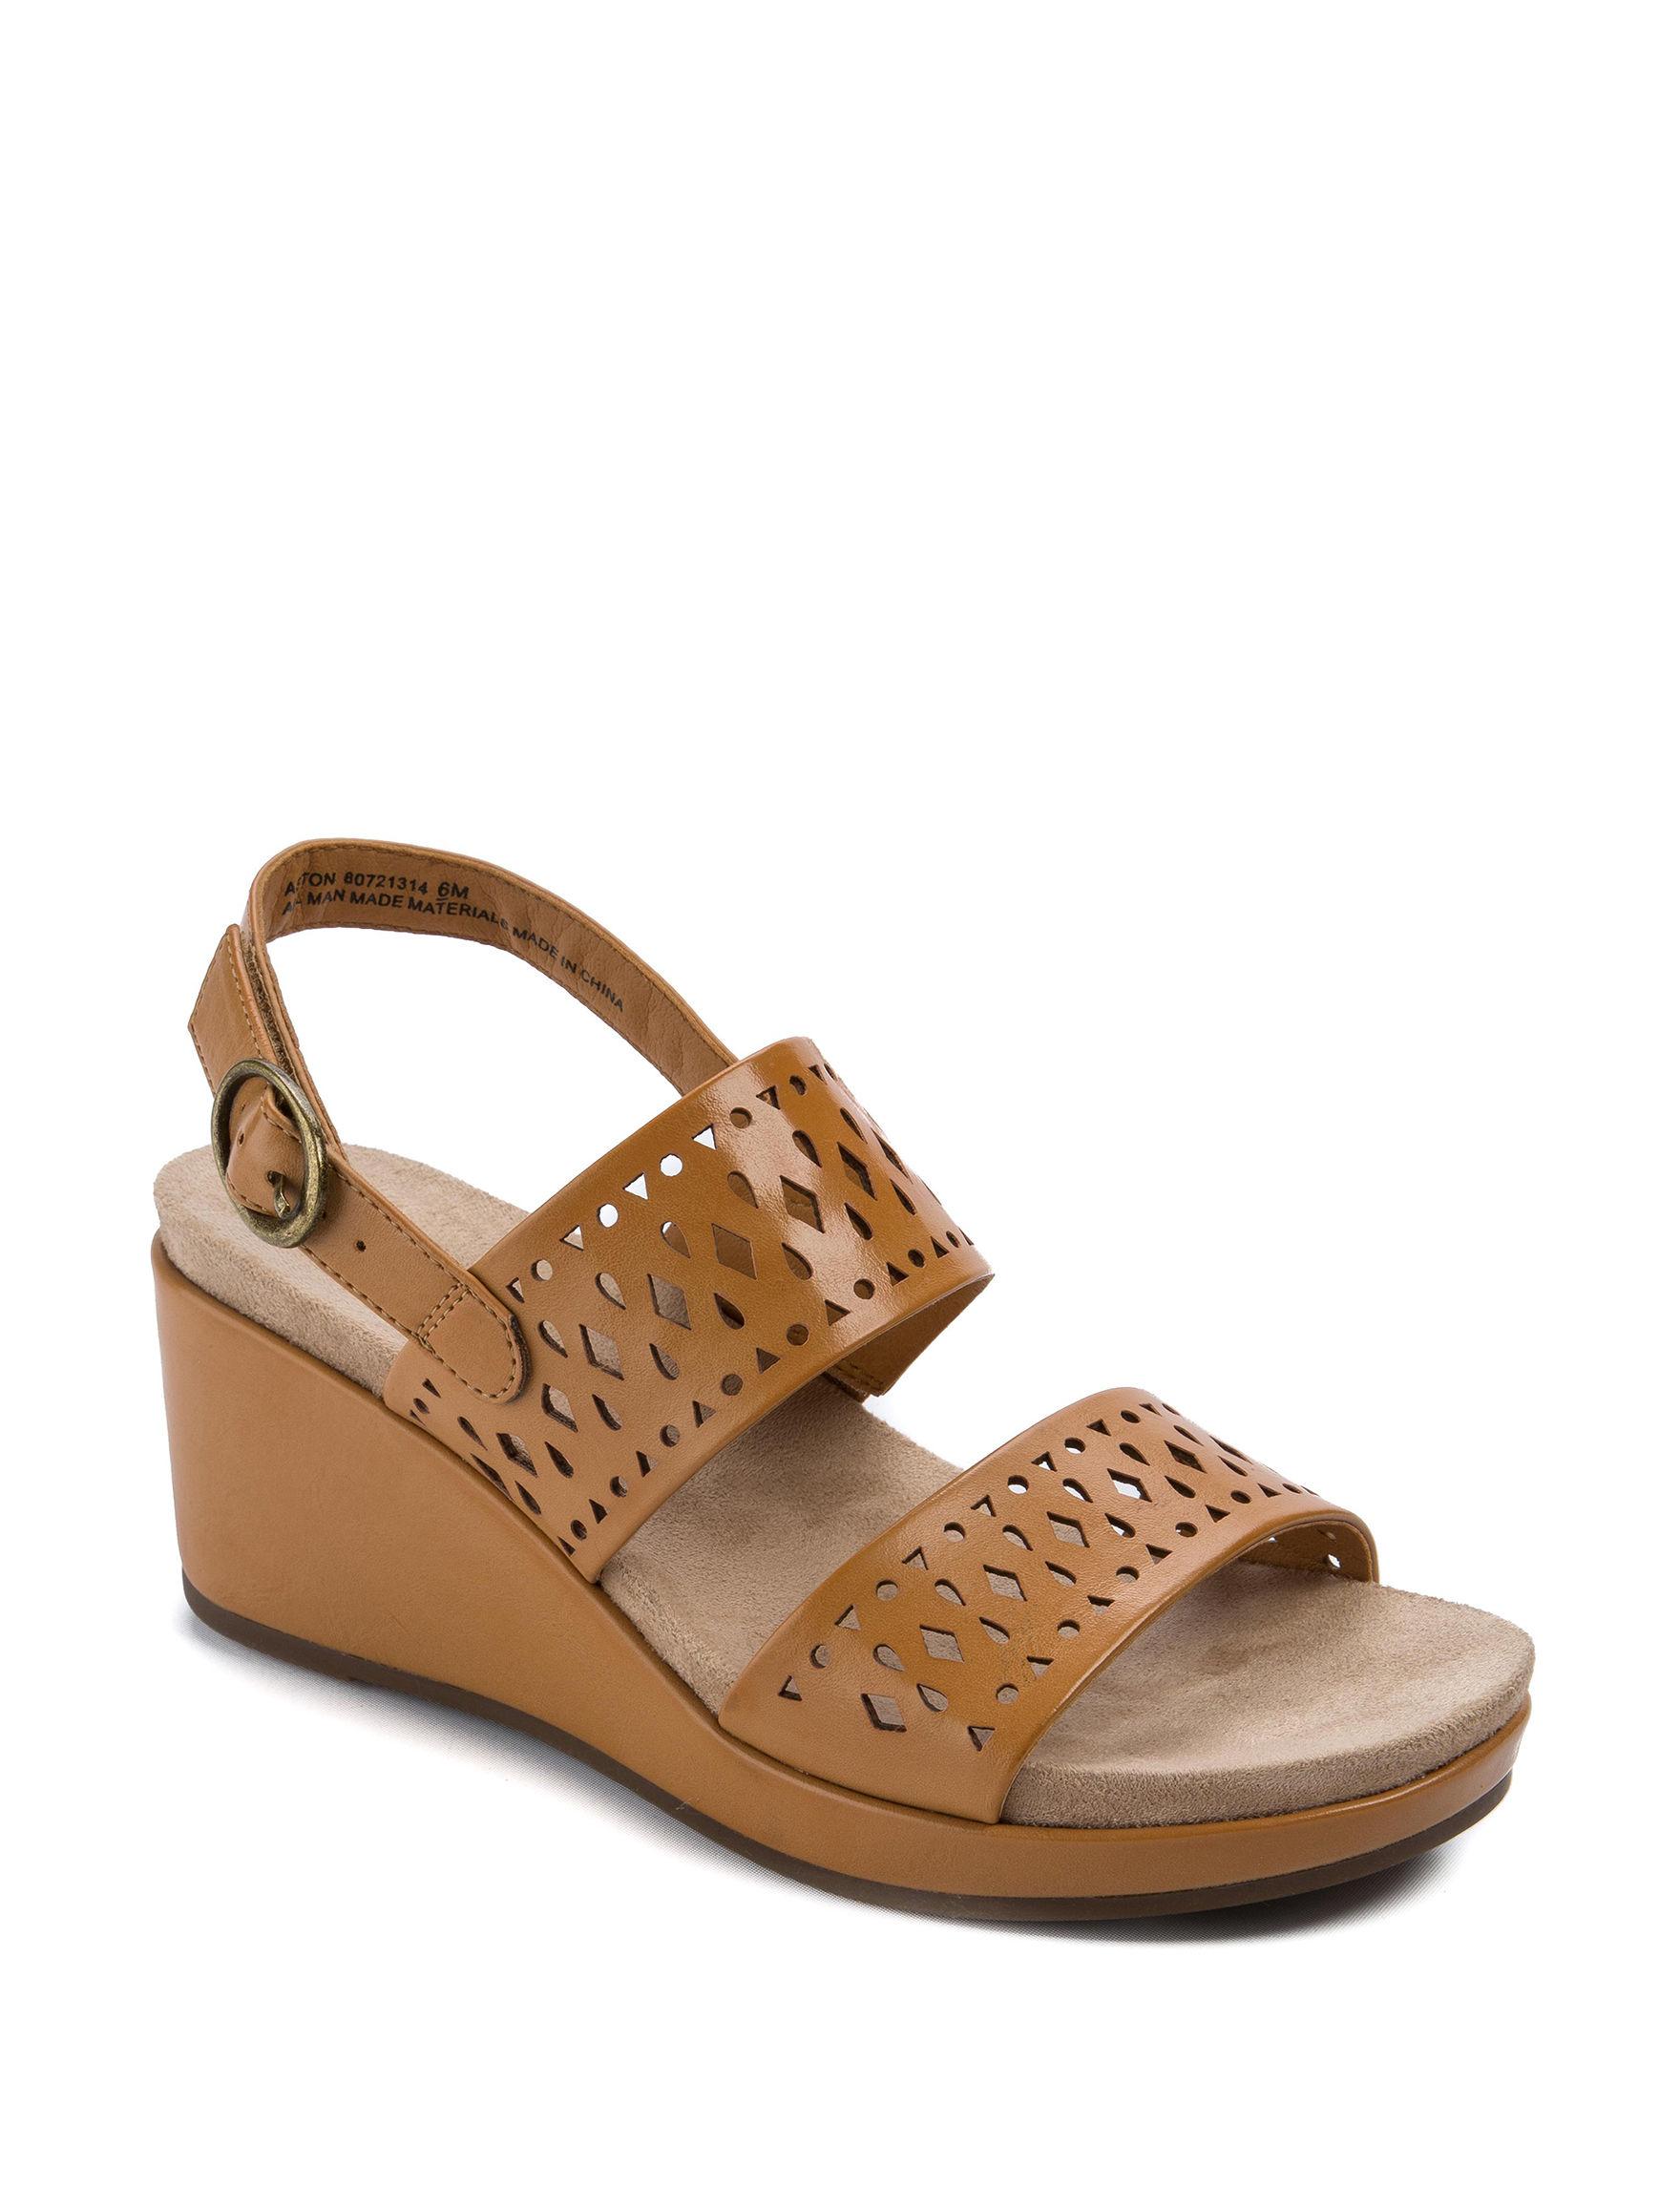 Wear. Ever. Brown Wedge Sandals